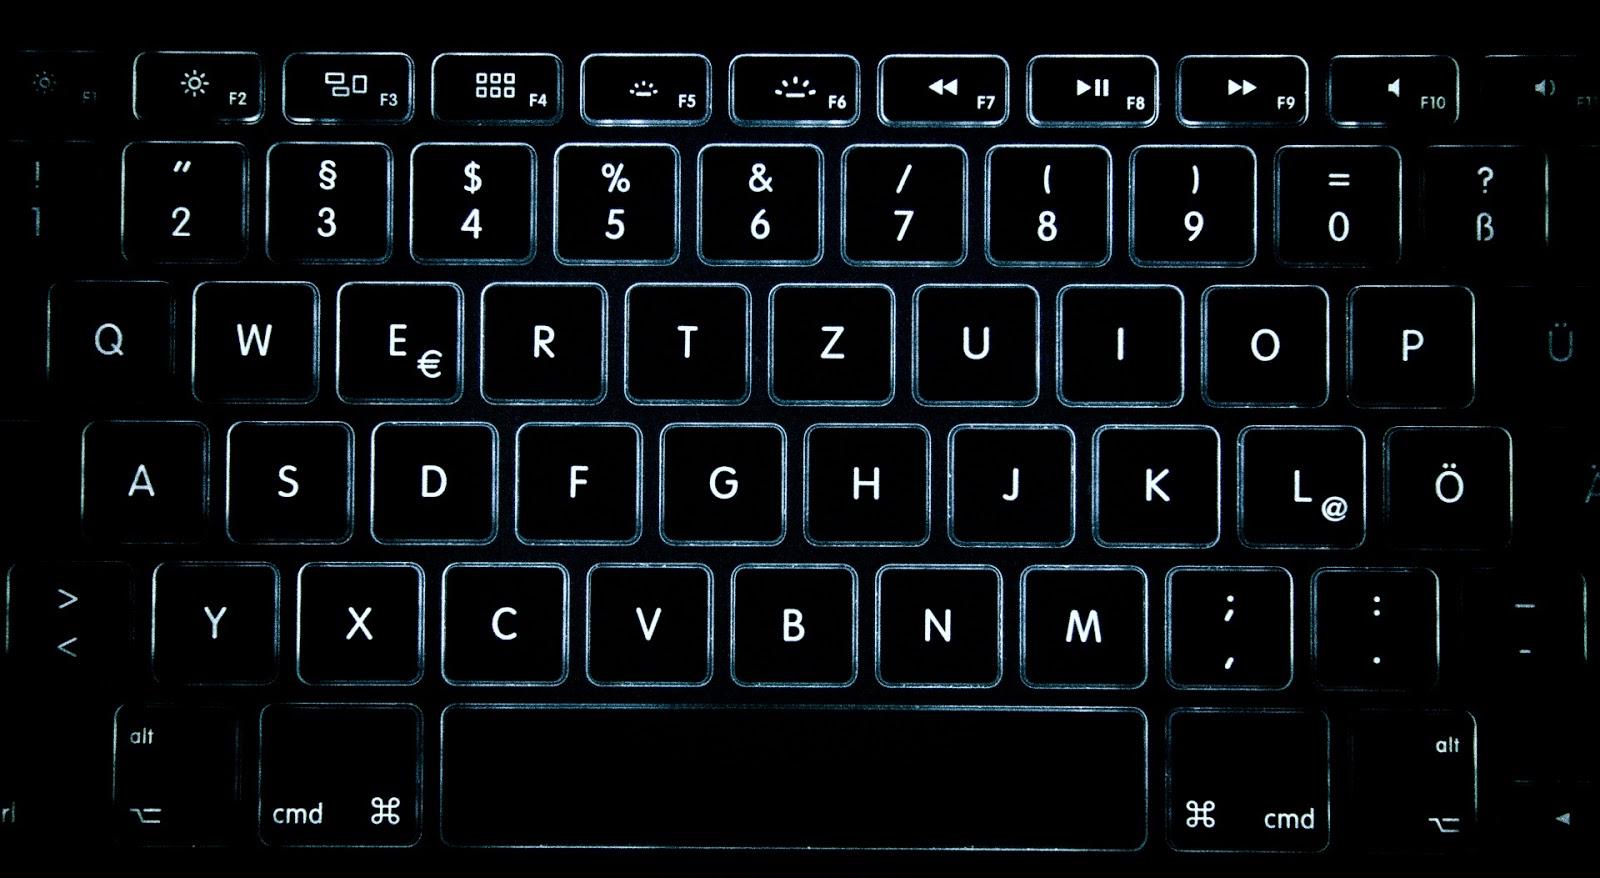 Download Just Keys Wallpaper, Keyboard Wallpapers Black